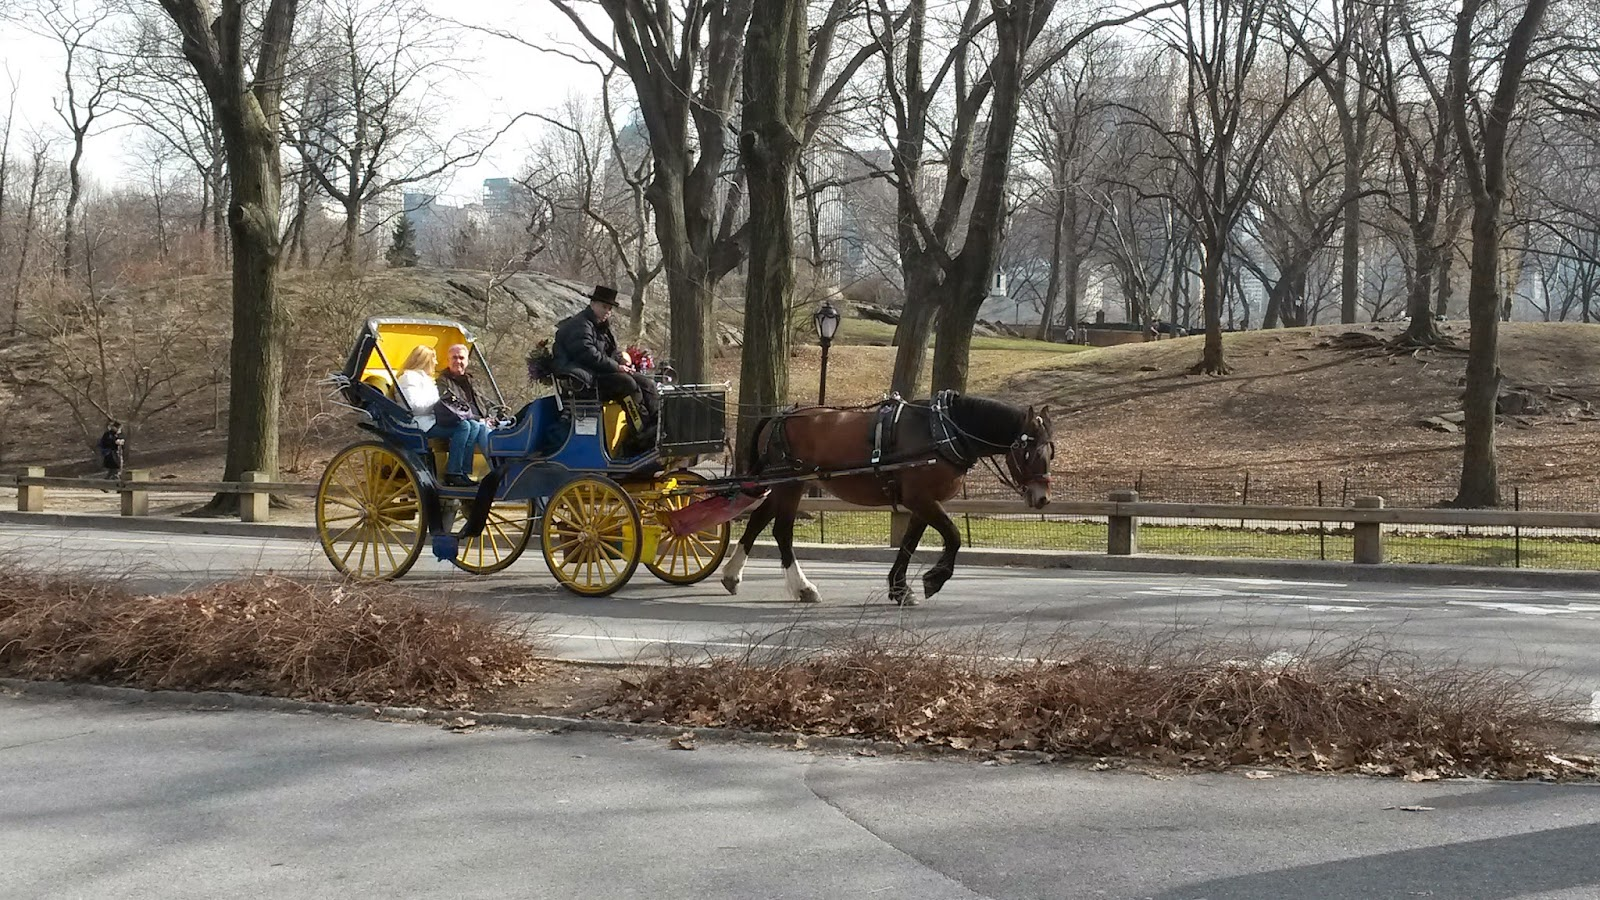 Carroza, Mateo, Central Park, Manhattan, New York, Elisa N, Blog de Viajes, Lifestyle, Travel